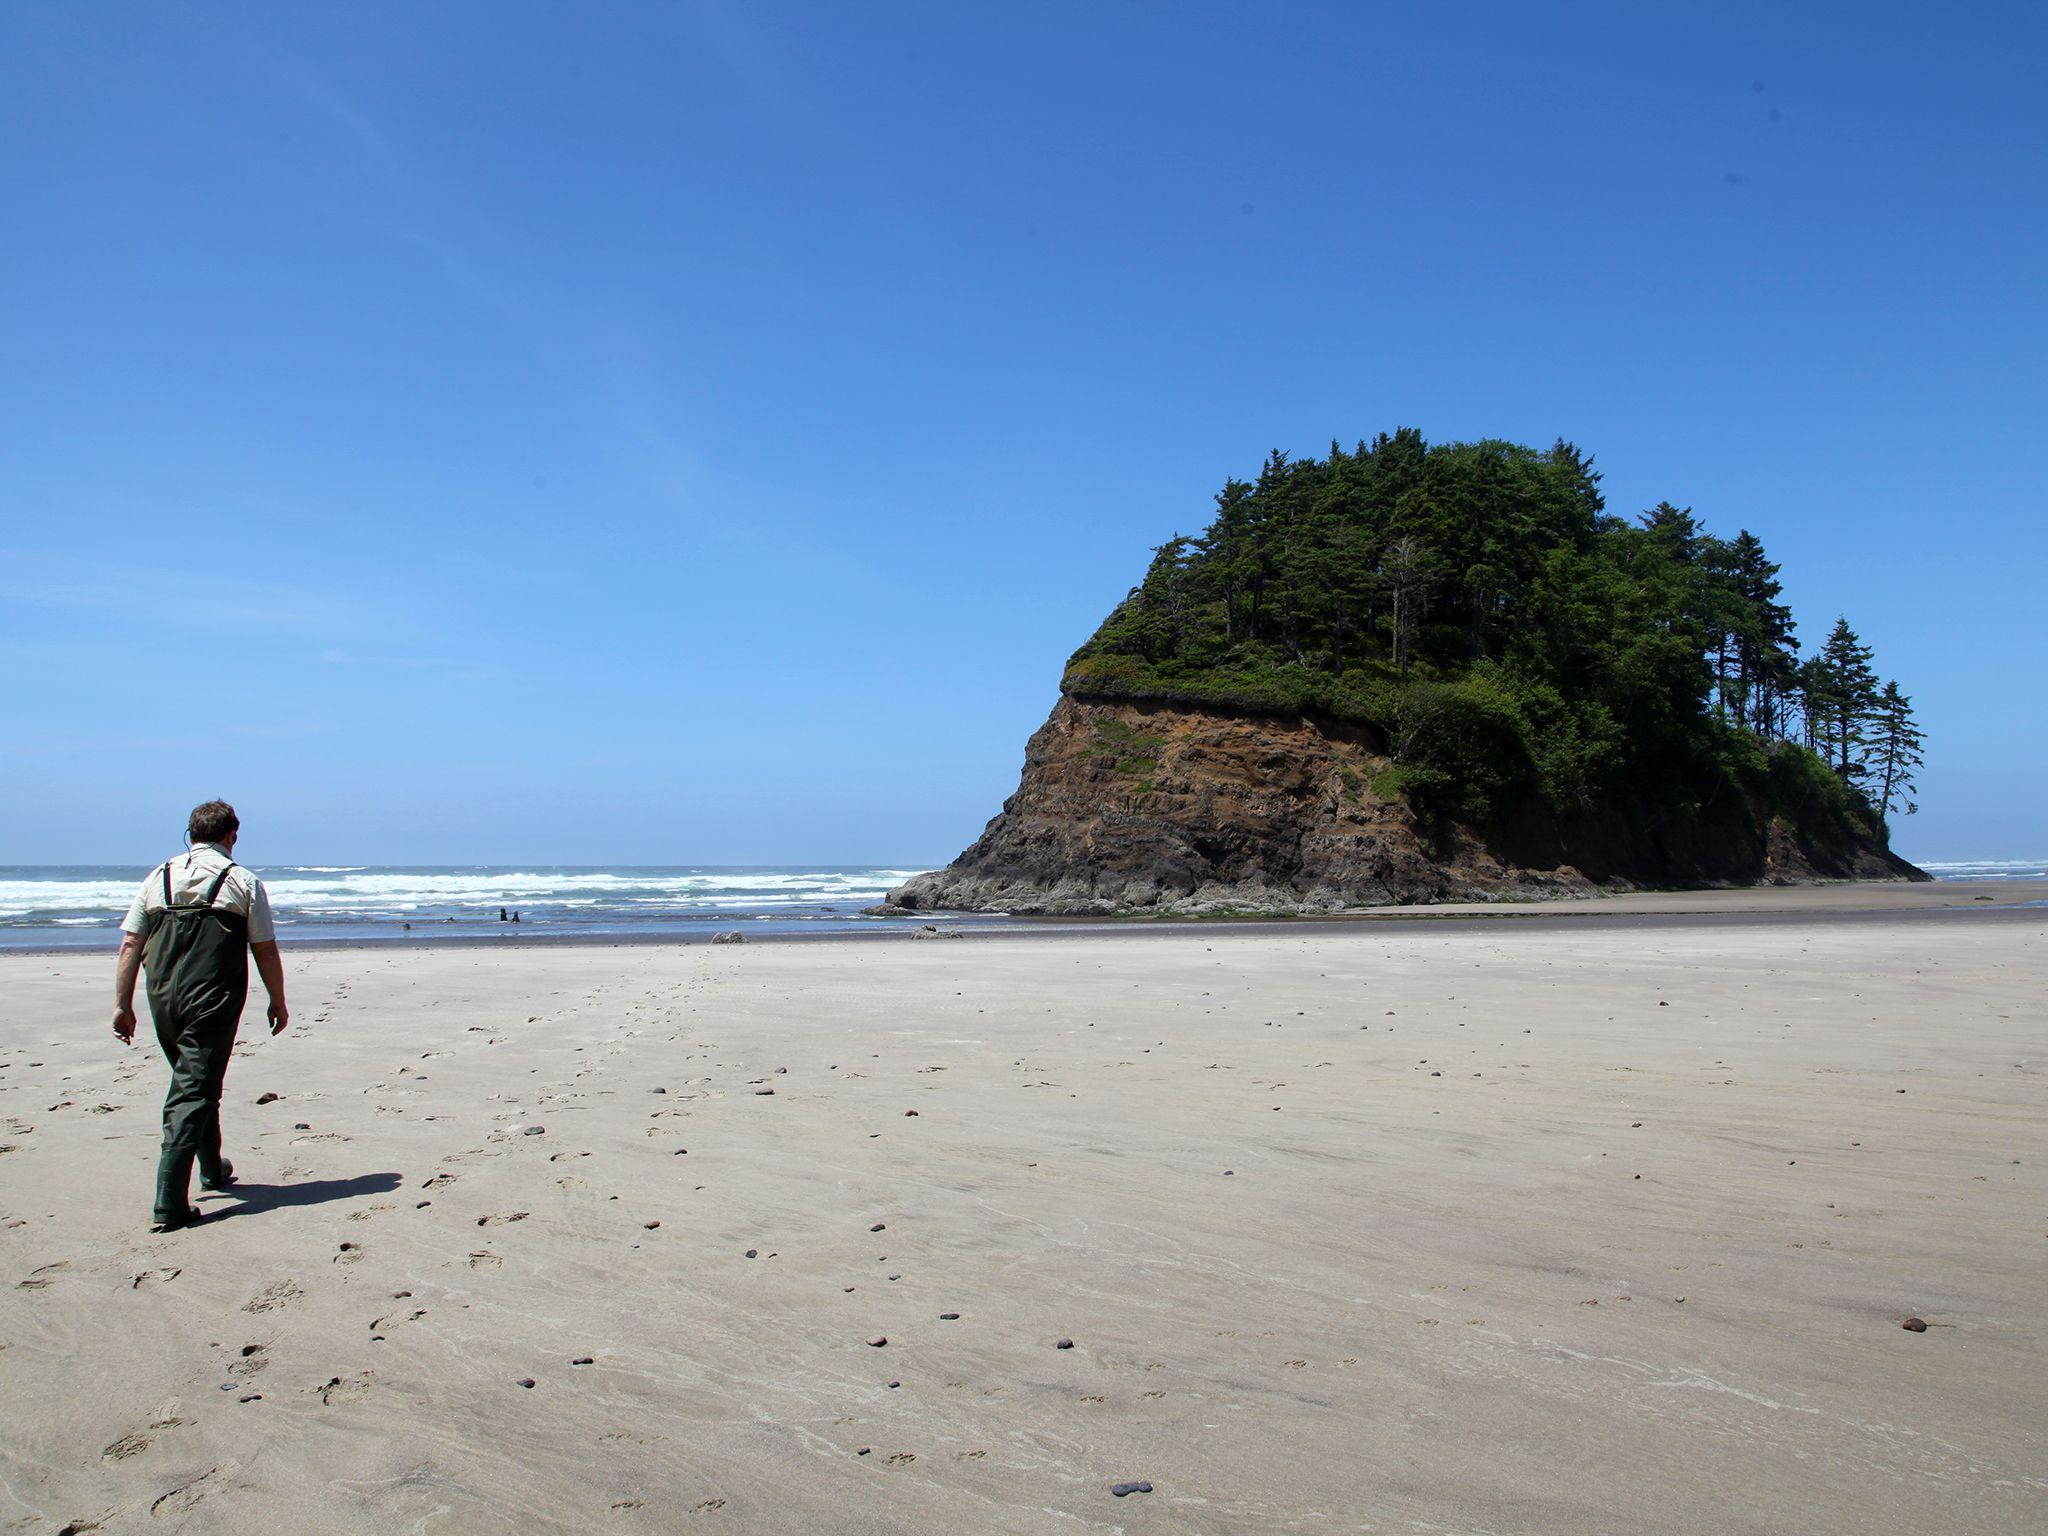 Neskowin, OR, USA: Professor Chris Goldfinger, Paleo Seismologist at Oregon State University... [Photo of the day - December 2014]